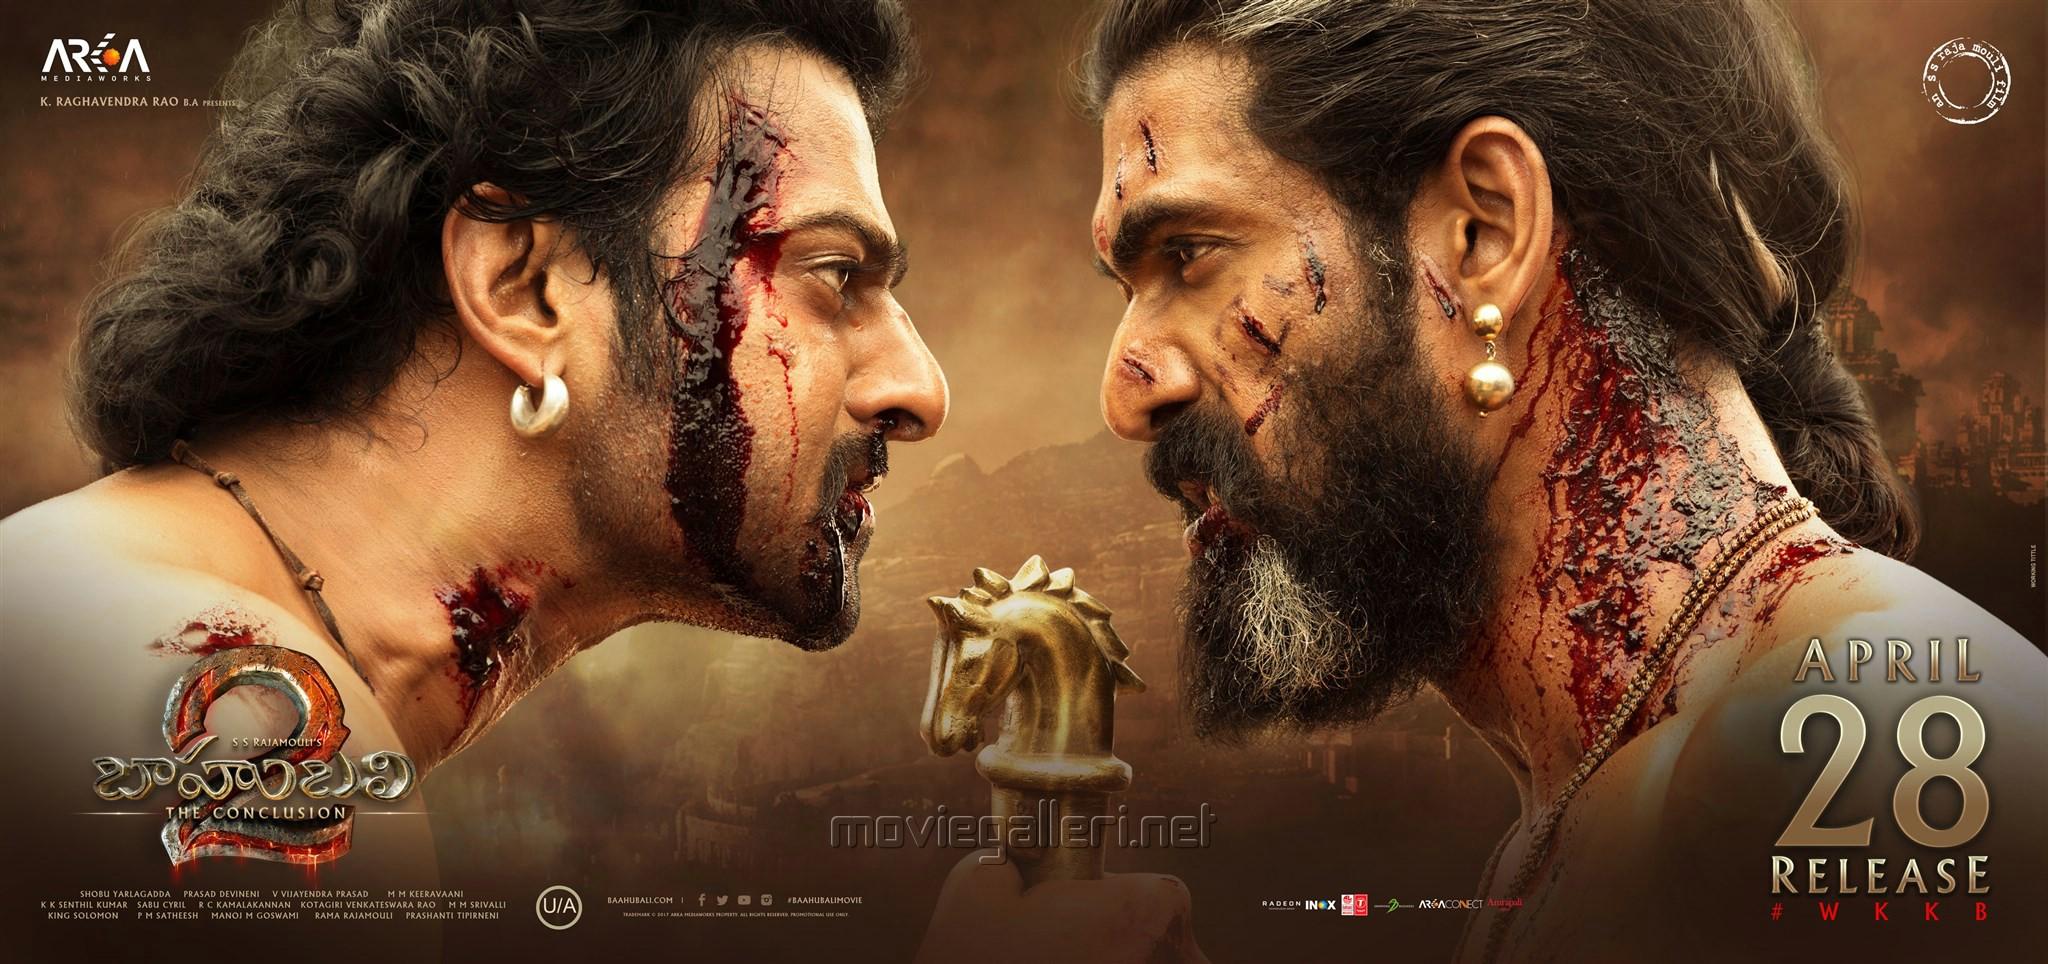 Prabhas, Rana Daggubati in Baahubali 2 Movie April 28 Release Wallpapers